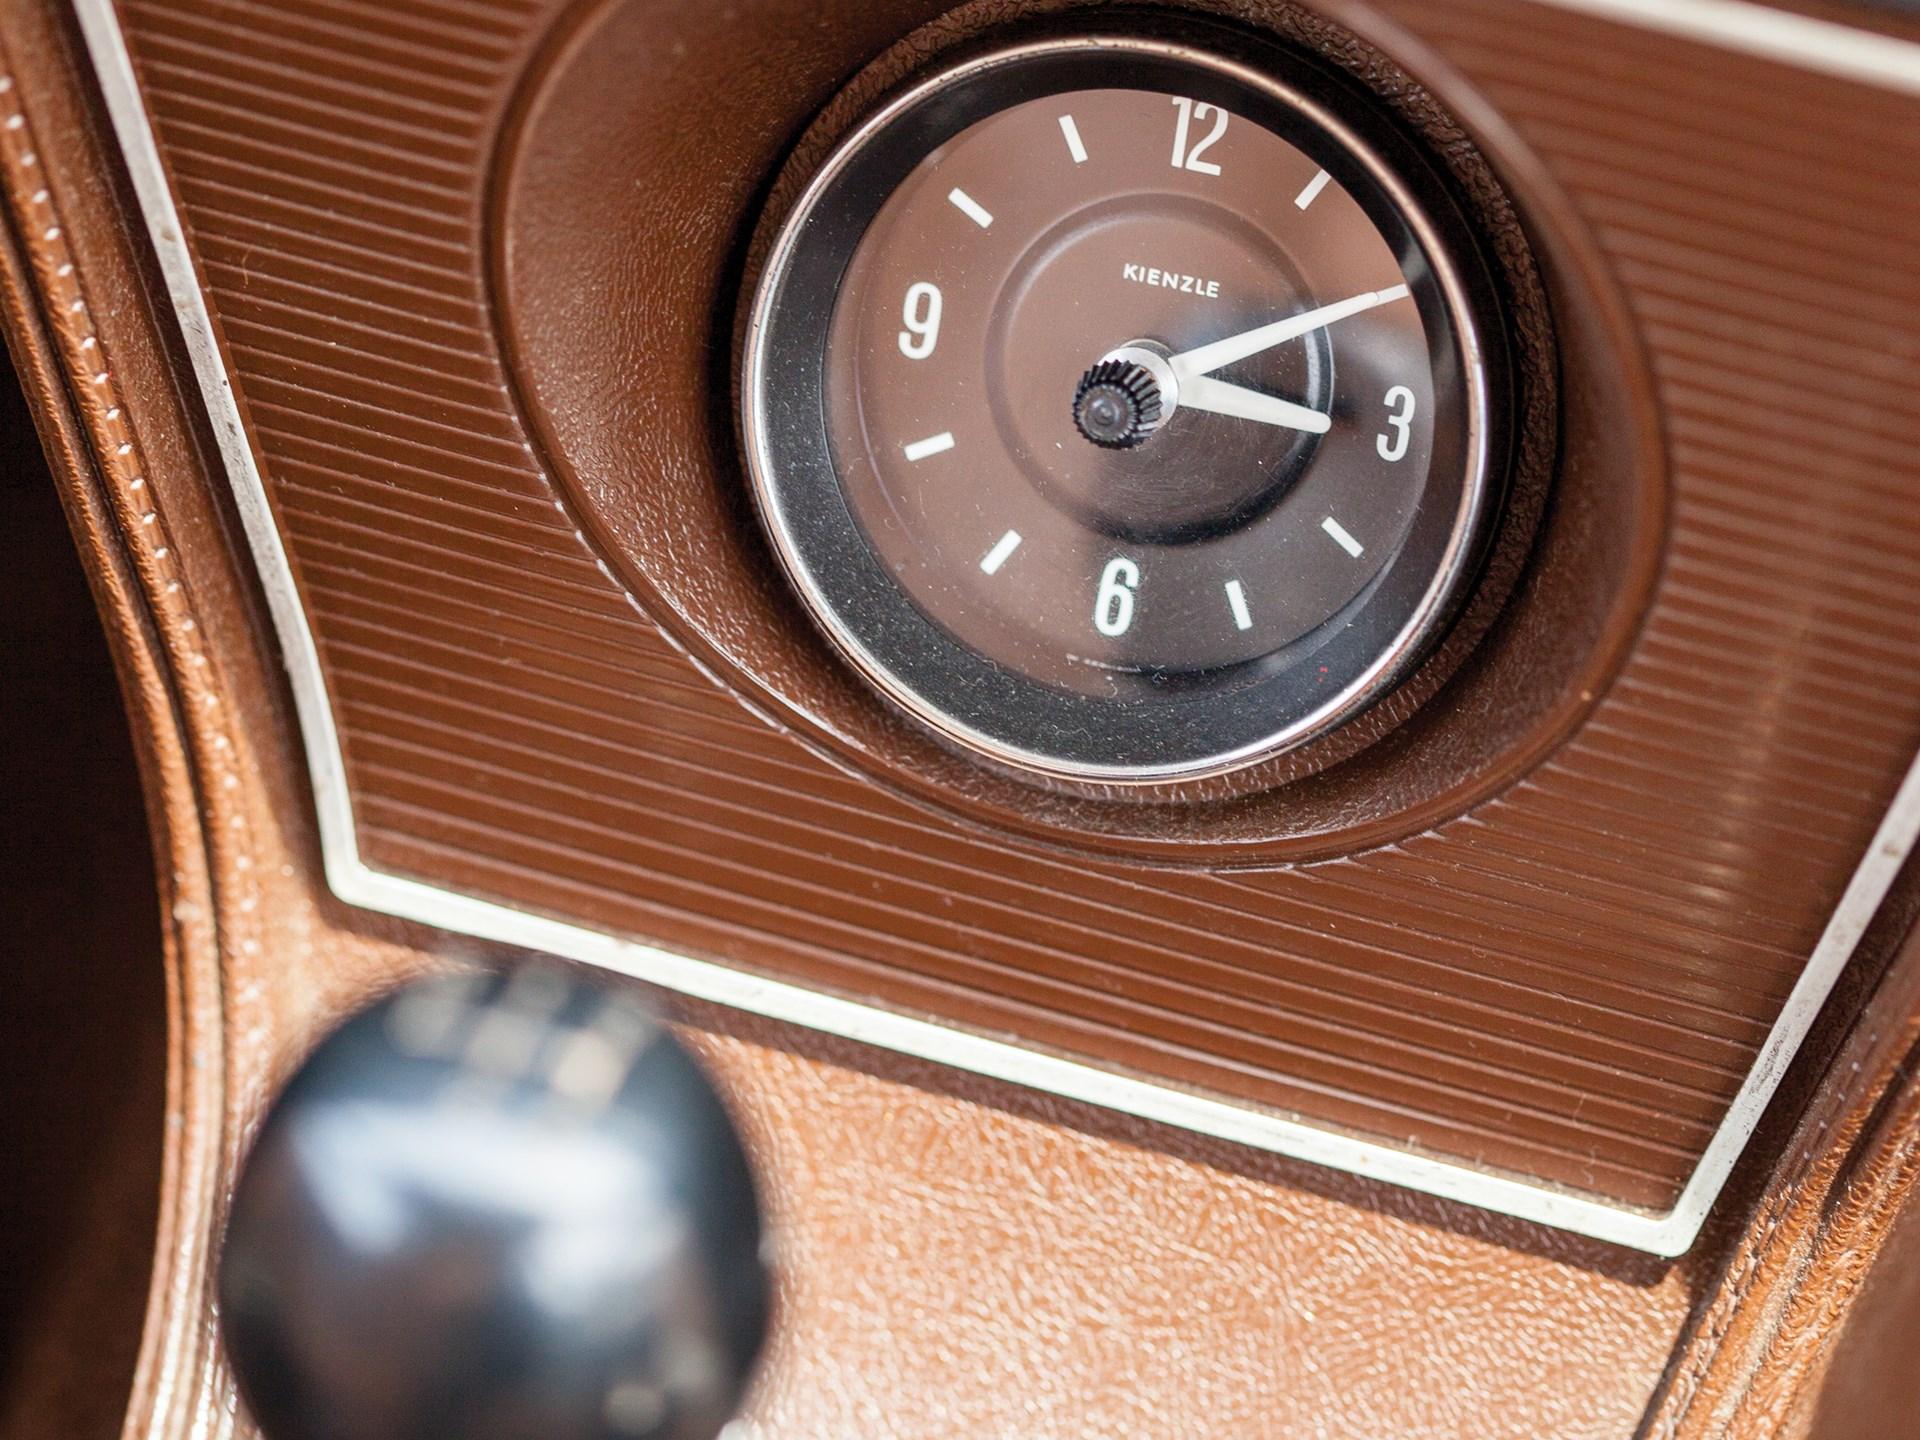 RM Sotheby's - 1969 Ford Cortina Lotus Mk 2 | London 2014